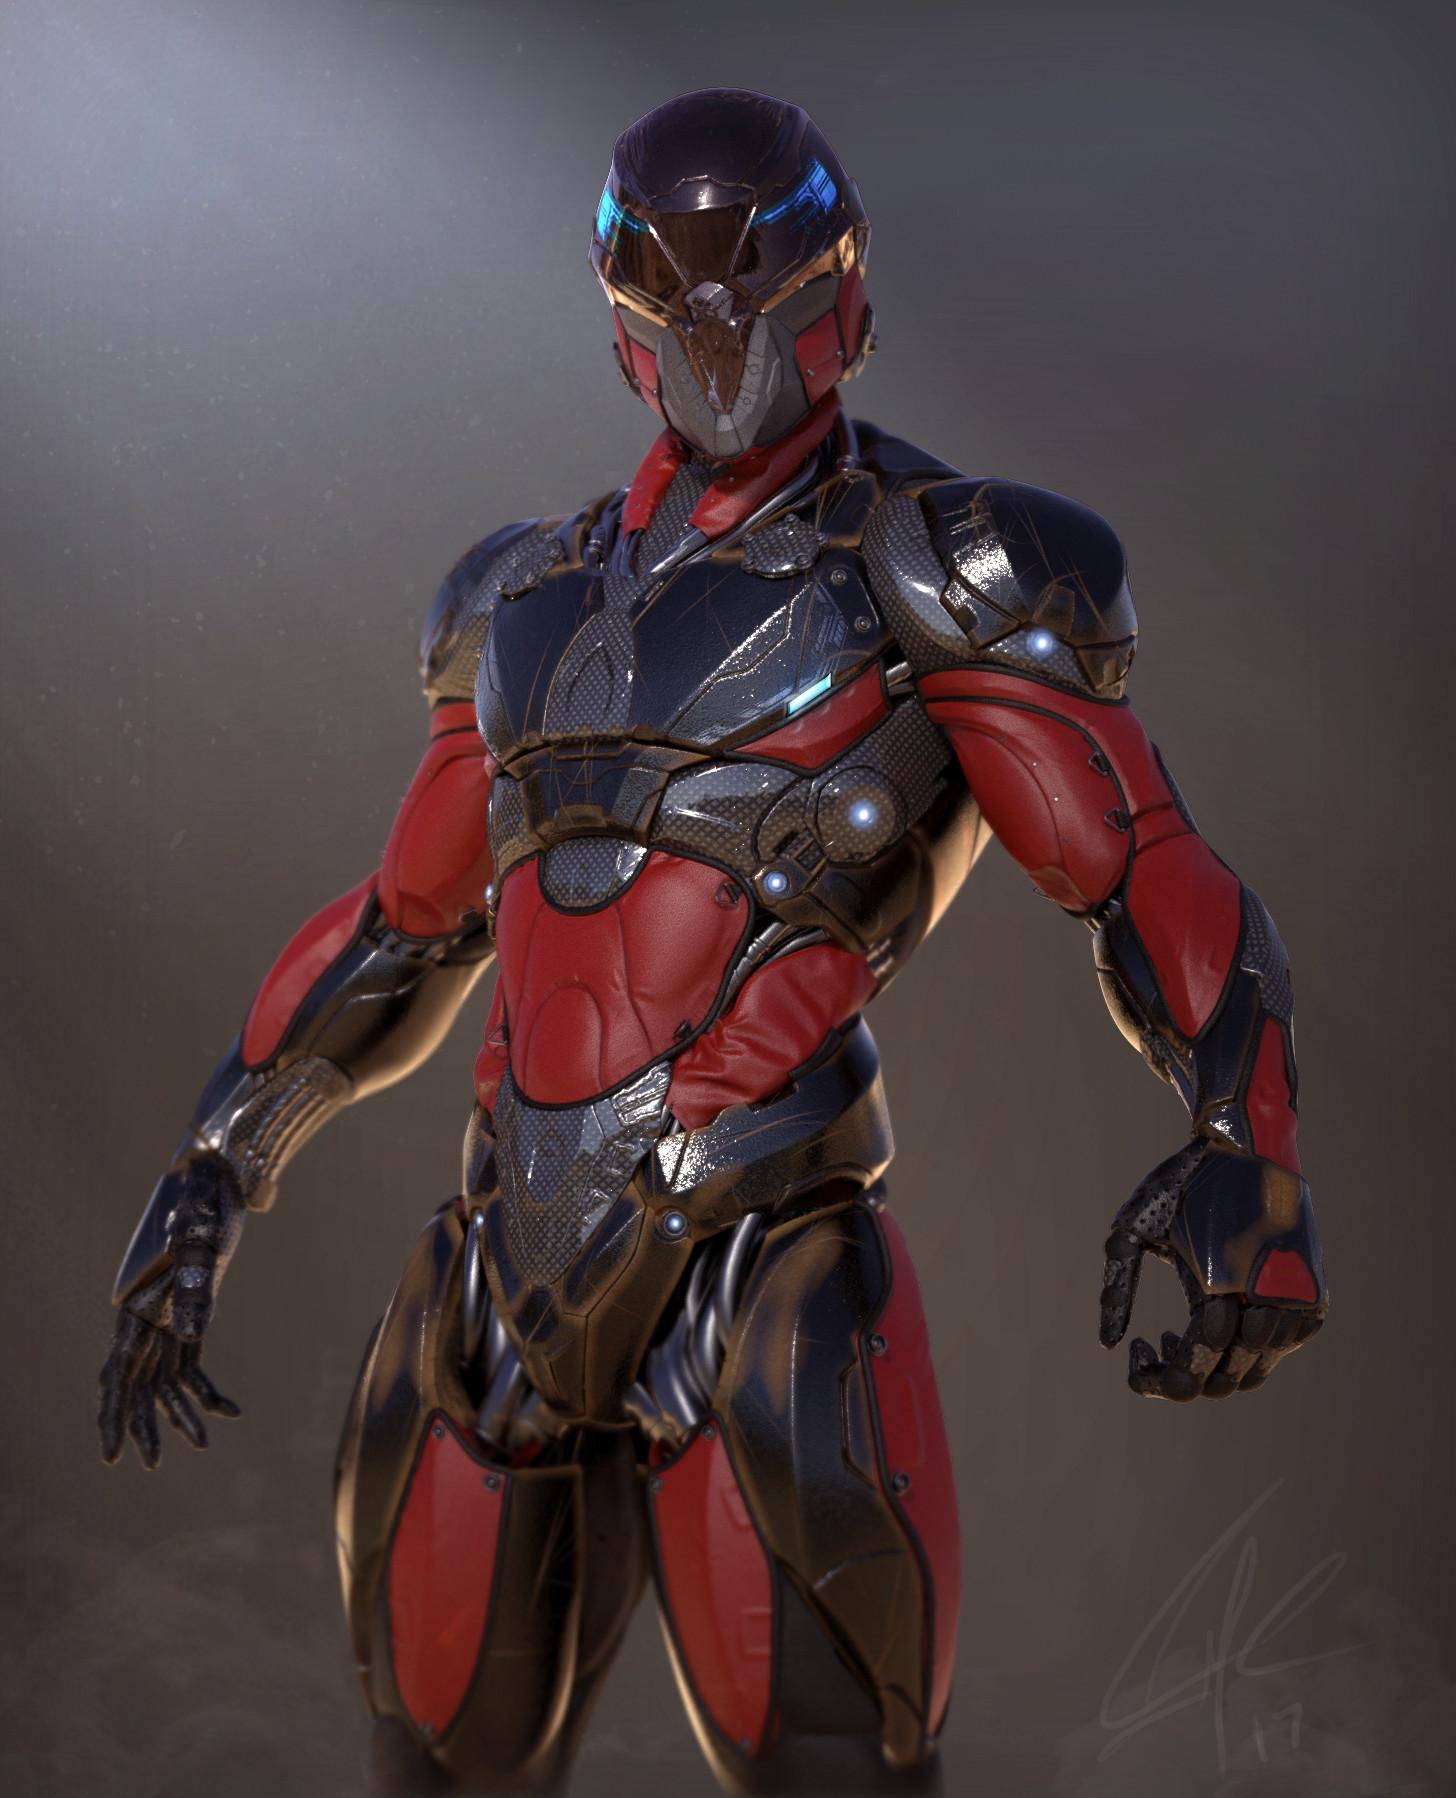 joey-morel-carrier-sci-fi-armor.jpg